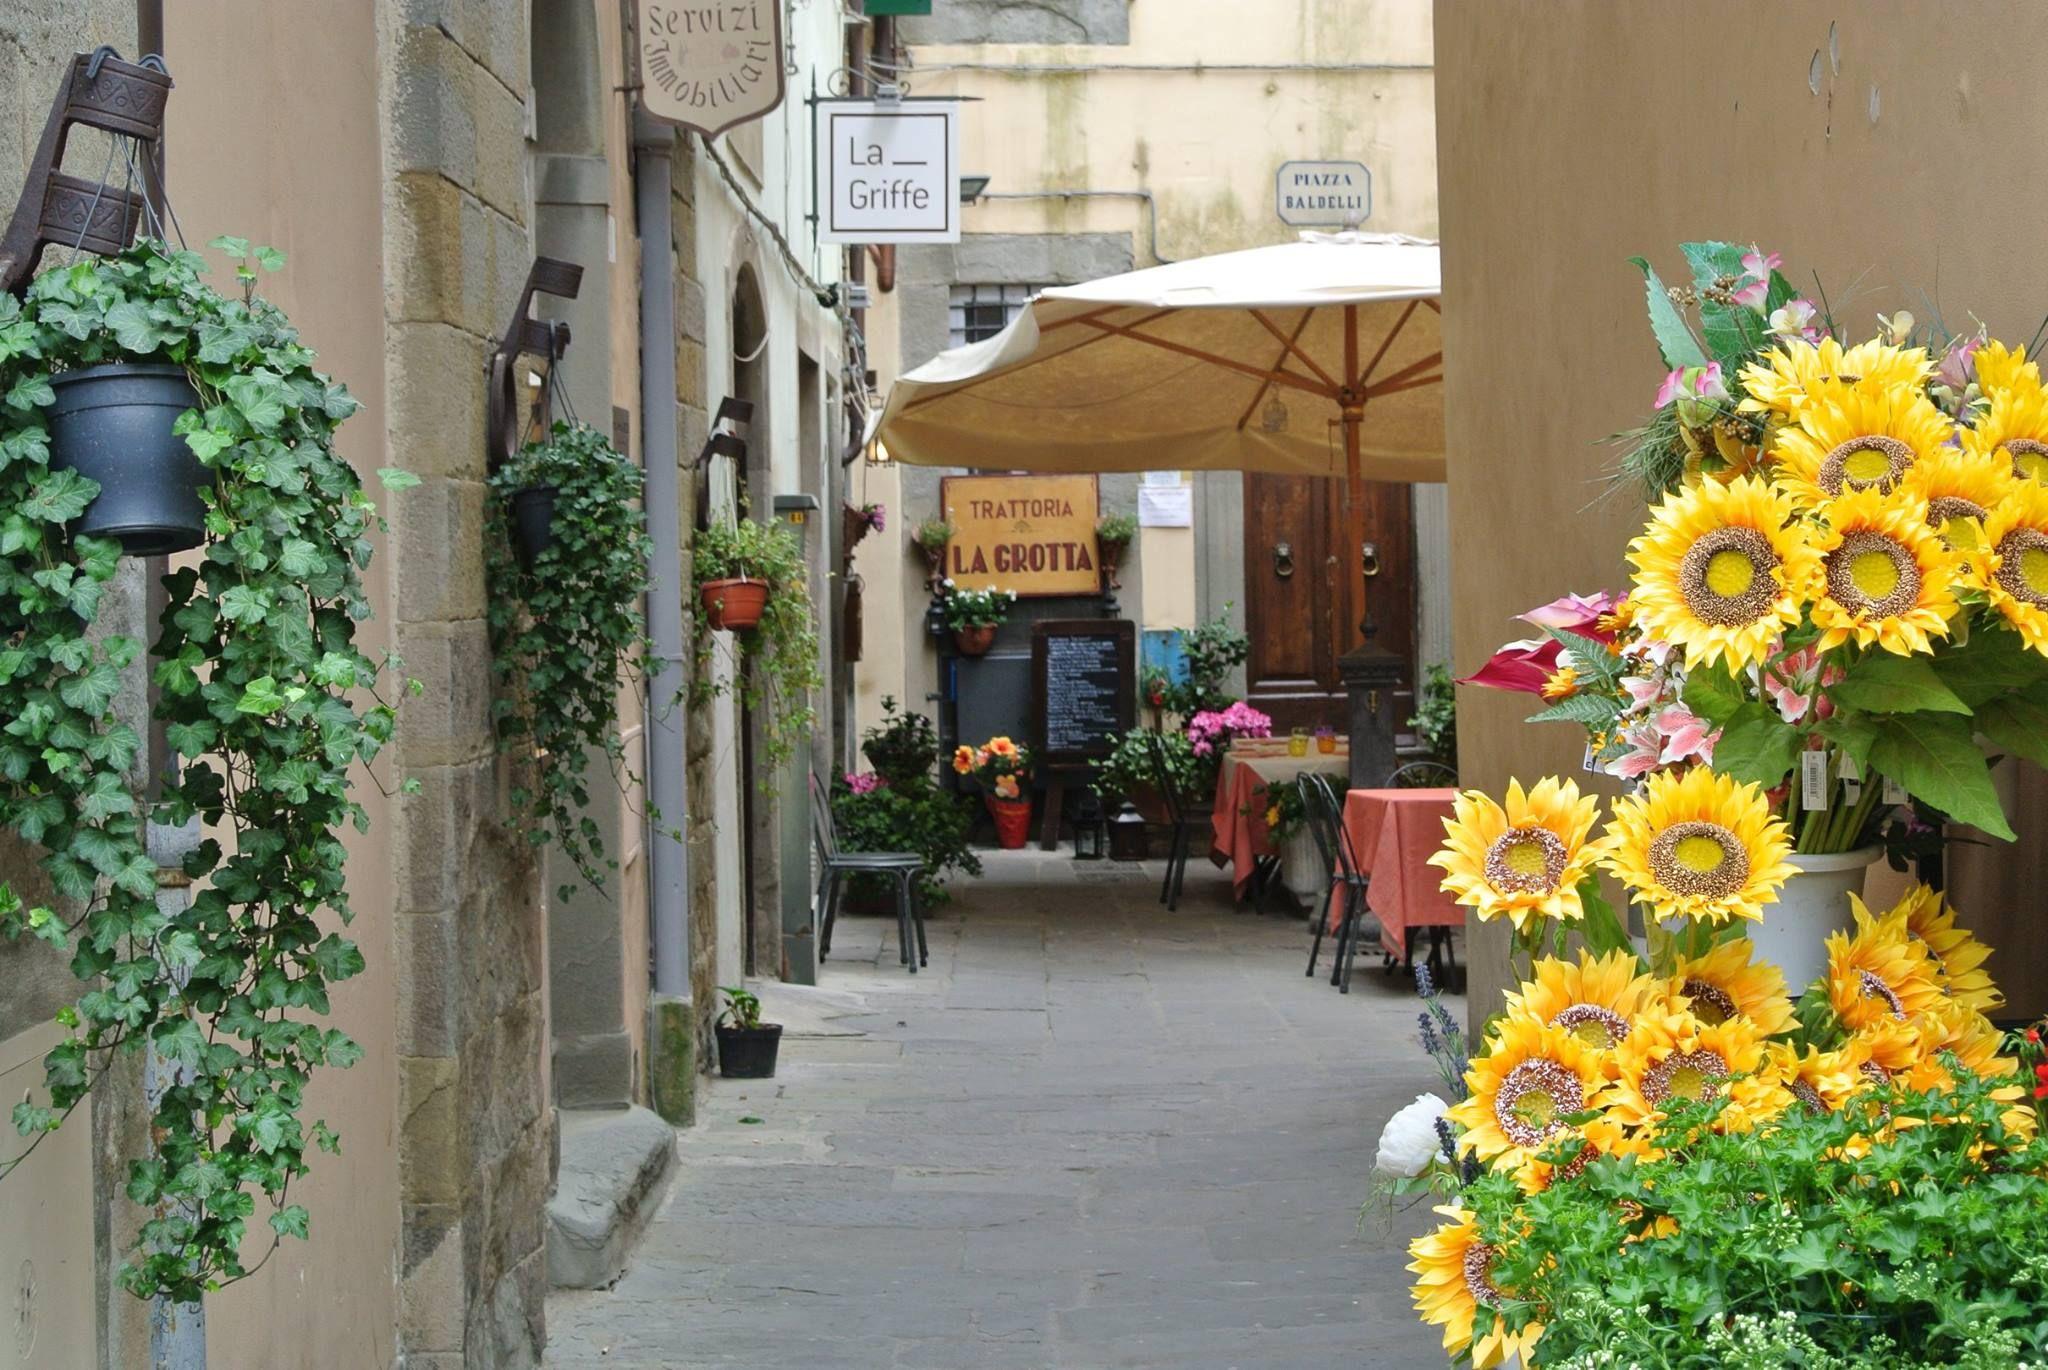 lunch time   www.cookintuscany.com     #italy #culinary #cooking #school #cookintuscany #italyiloveyou #allinclusive #montepulciano #italy #culinary #montefollonico #tuscany #school #class #schools #classes #cookery #cucina #travel #tour #trip #vacation #pienza #florence #siena #cook #cortona #pienza #pasta #iloveitaly #underthetuscansun #wine #vineyard #pool #church #domo #gelato #dog #vino